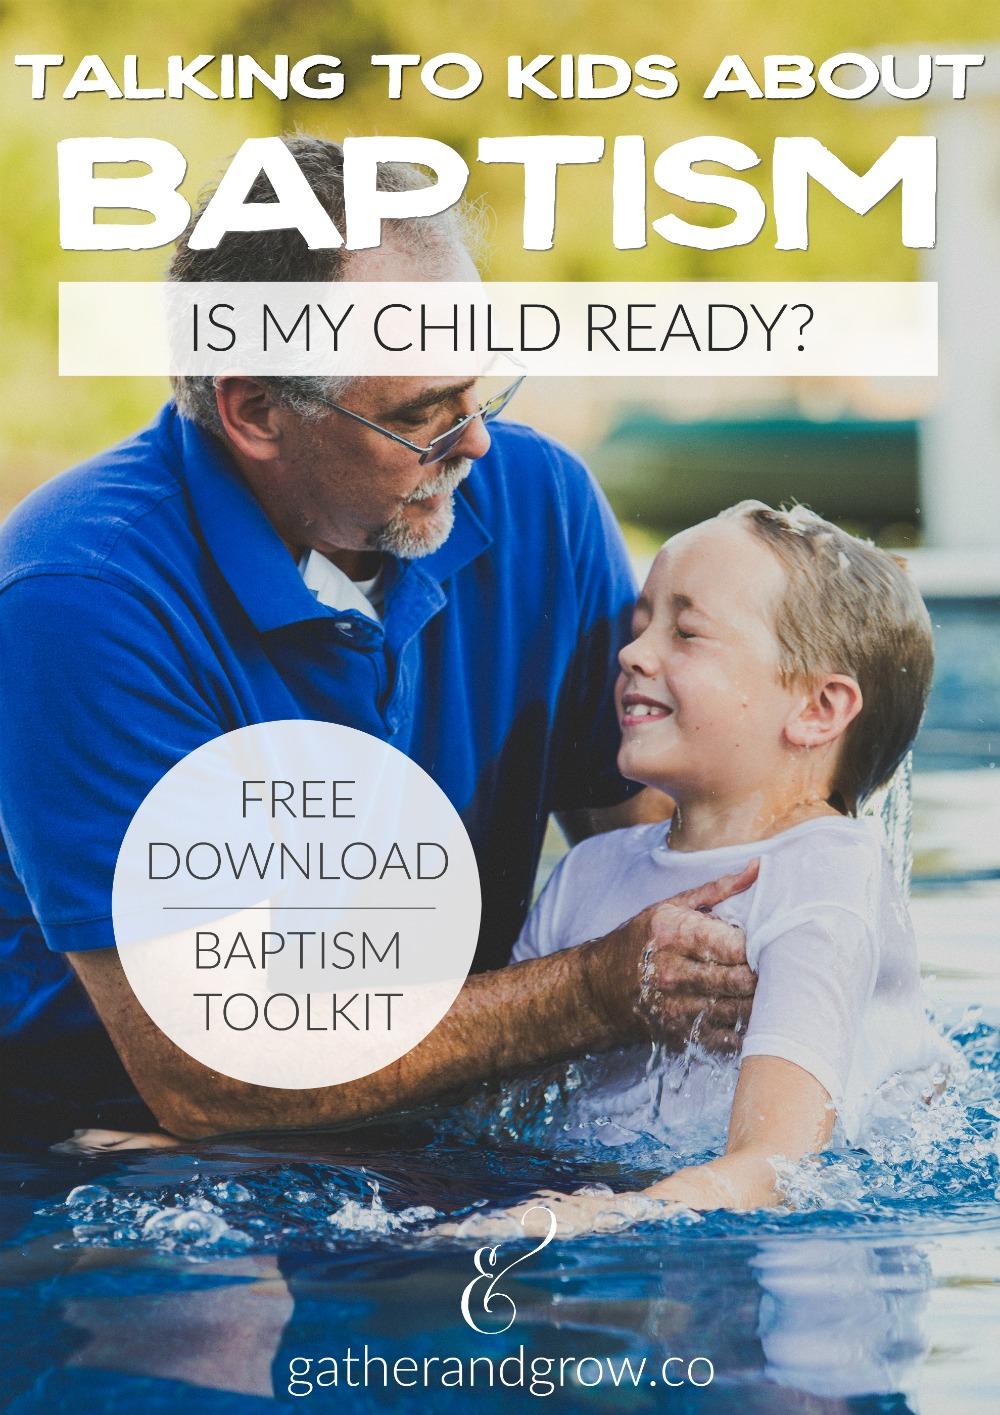 Talking to Kids About Baptism - Free Toolkit